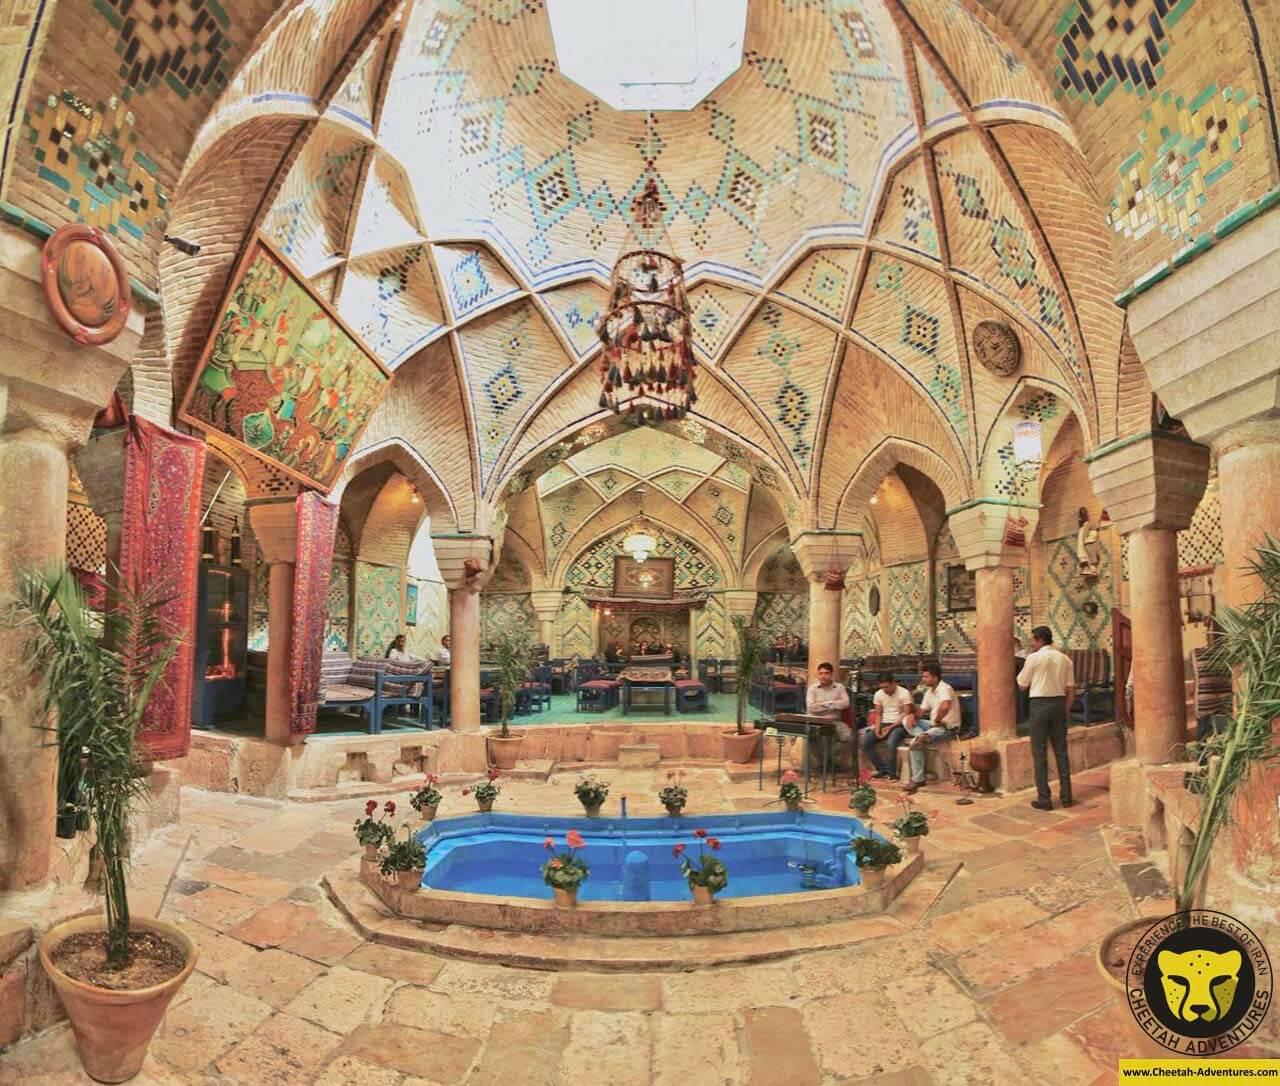 Vakil teahouse kerman travel guide iran tour package Cheetah adventures 3